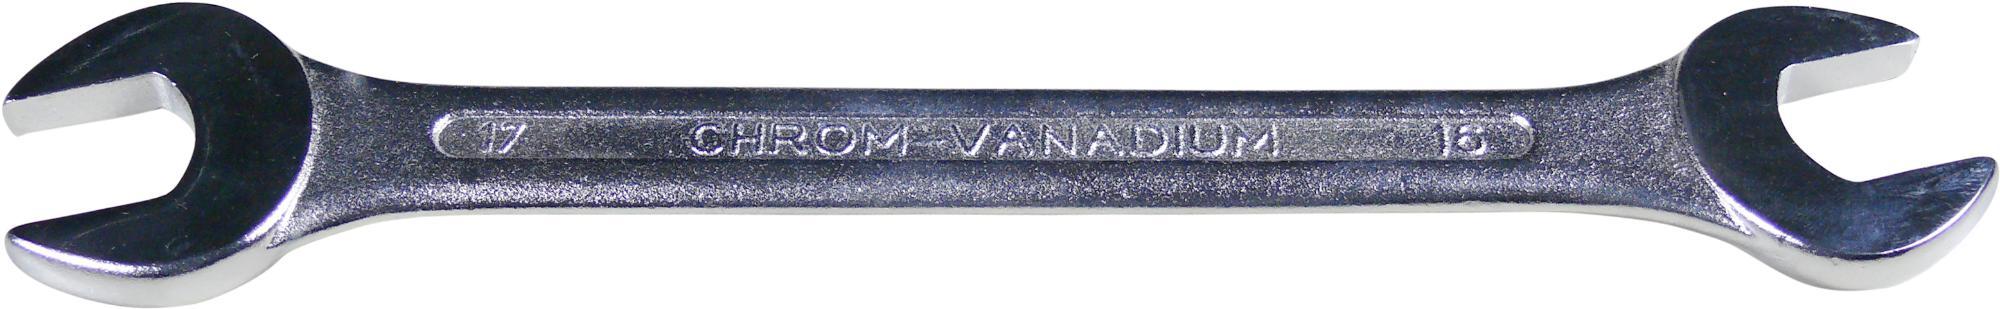 Kľúč vidlica-vidlica, 16x17 mm